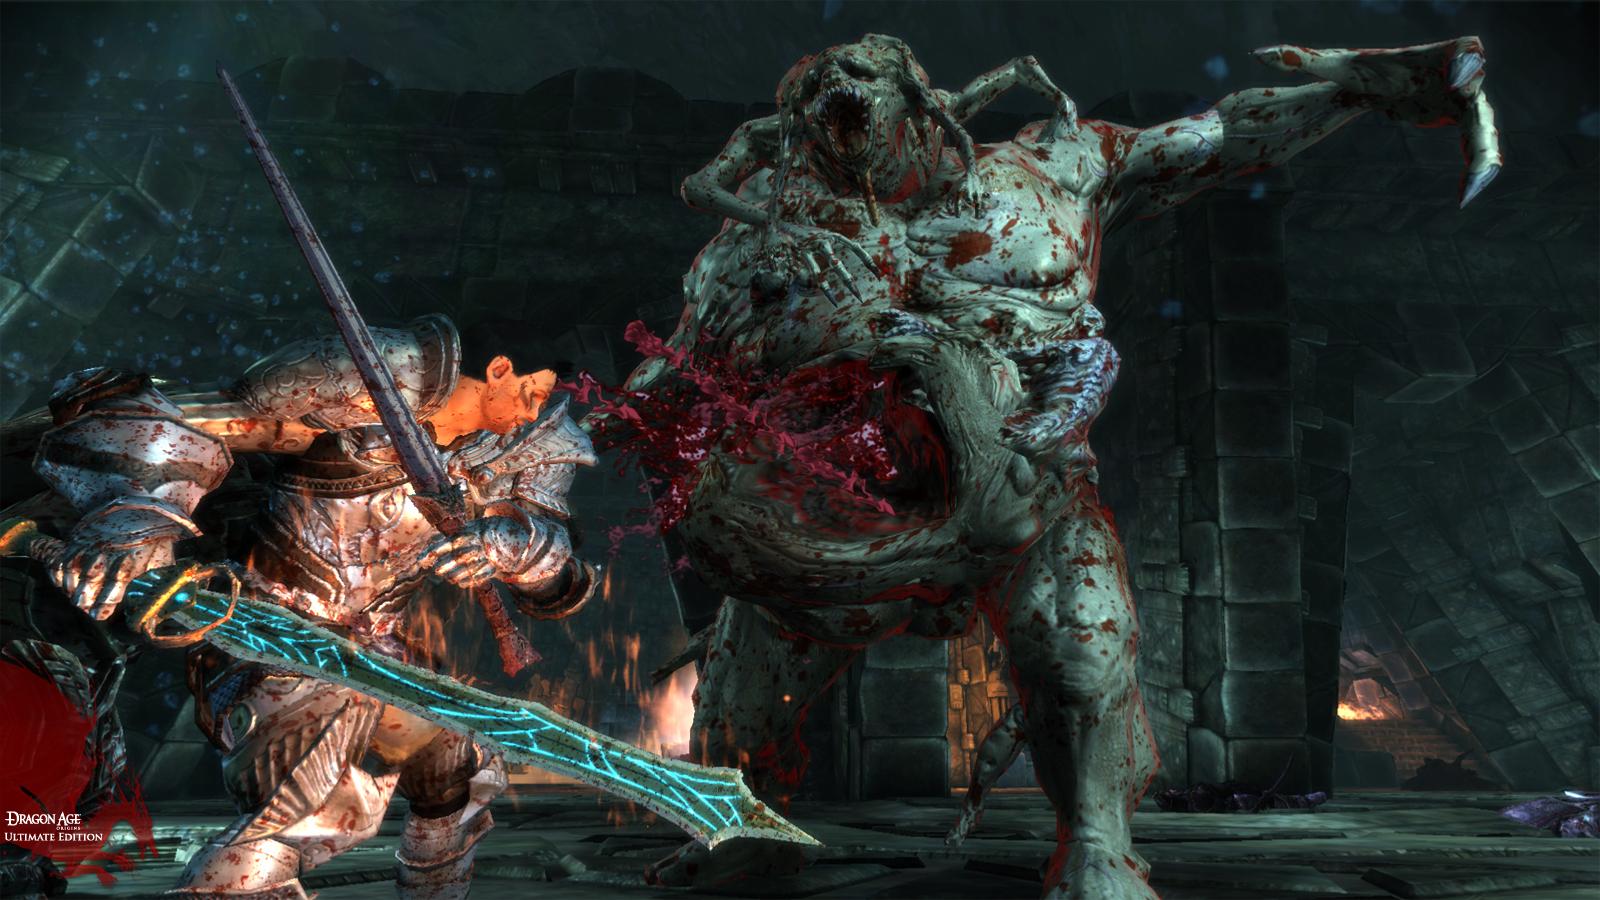 Dragon Age: Origins - Ultimate Edition screenshot